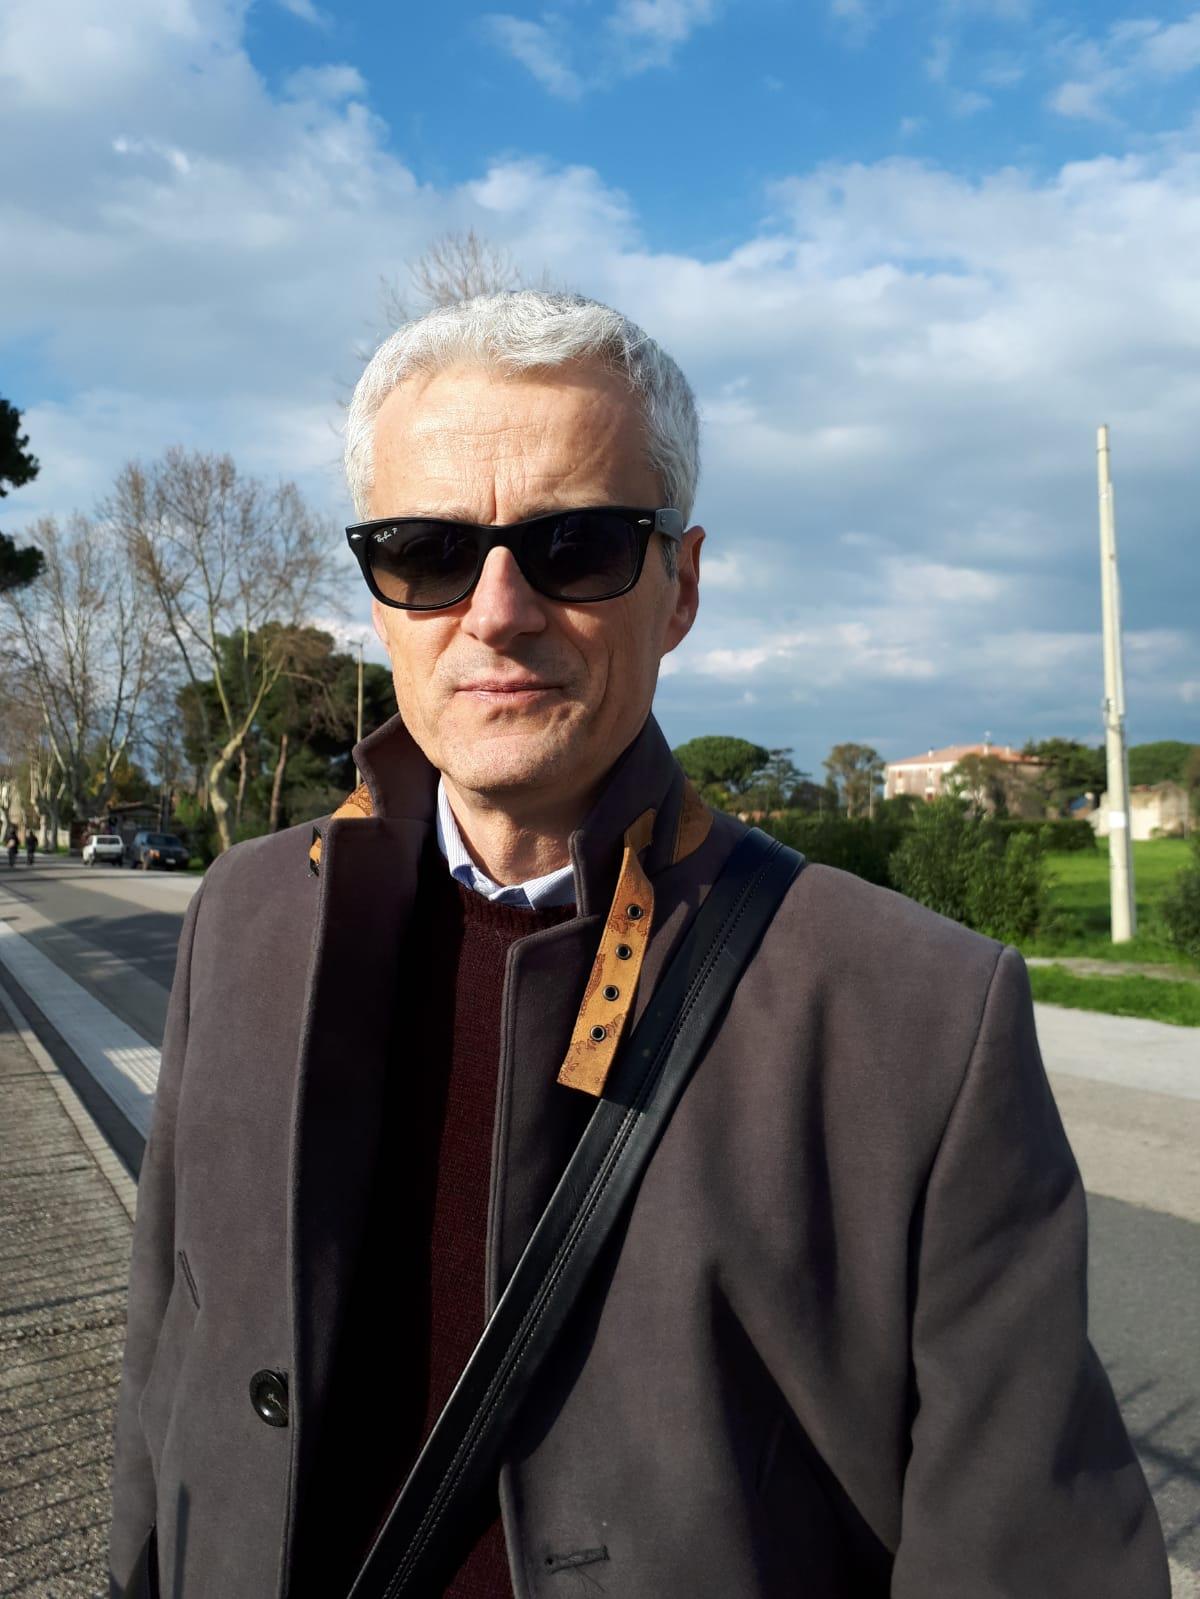 Michele Antonio Averardo